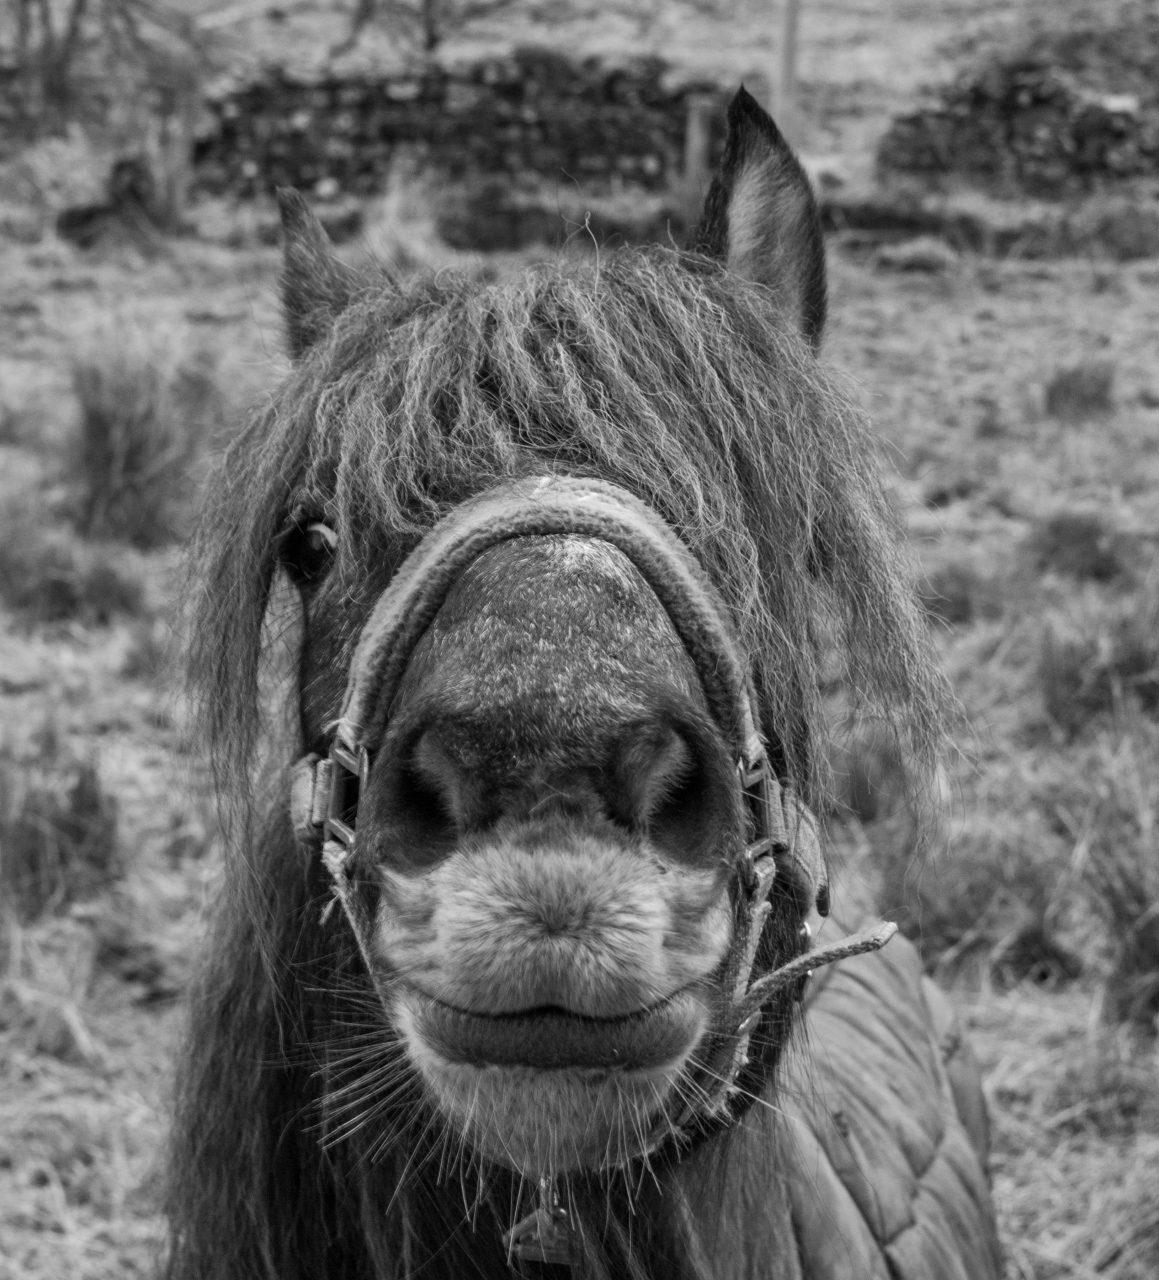 greyworldnomads-scotland-dunoon-58.jpg